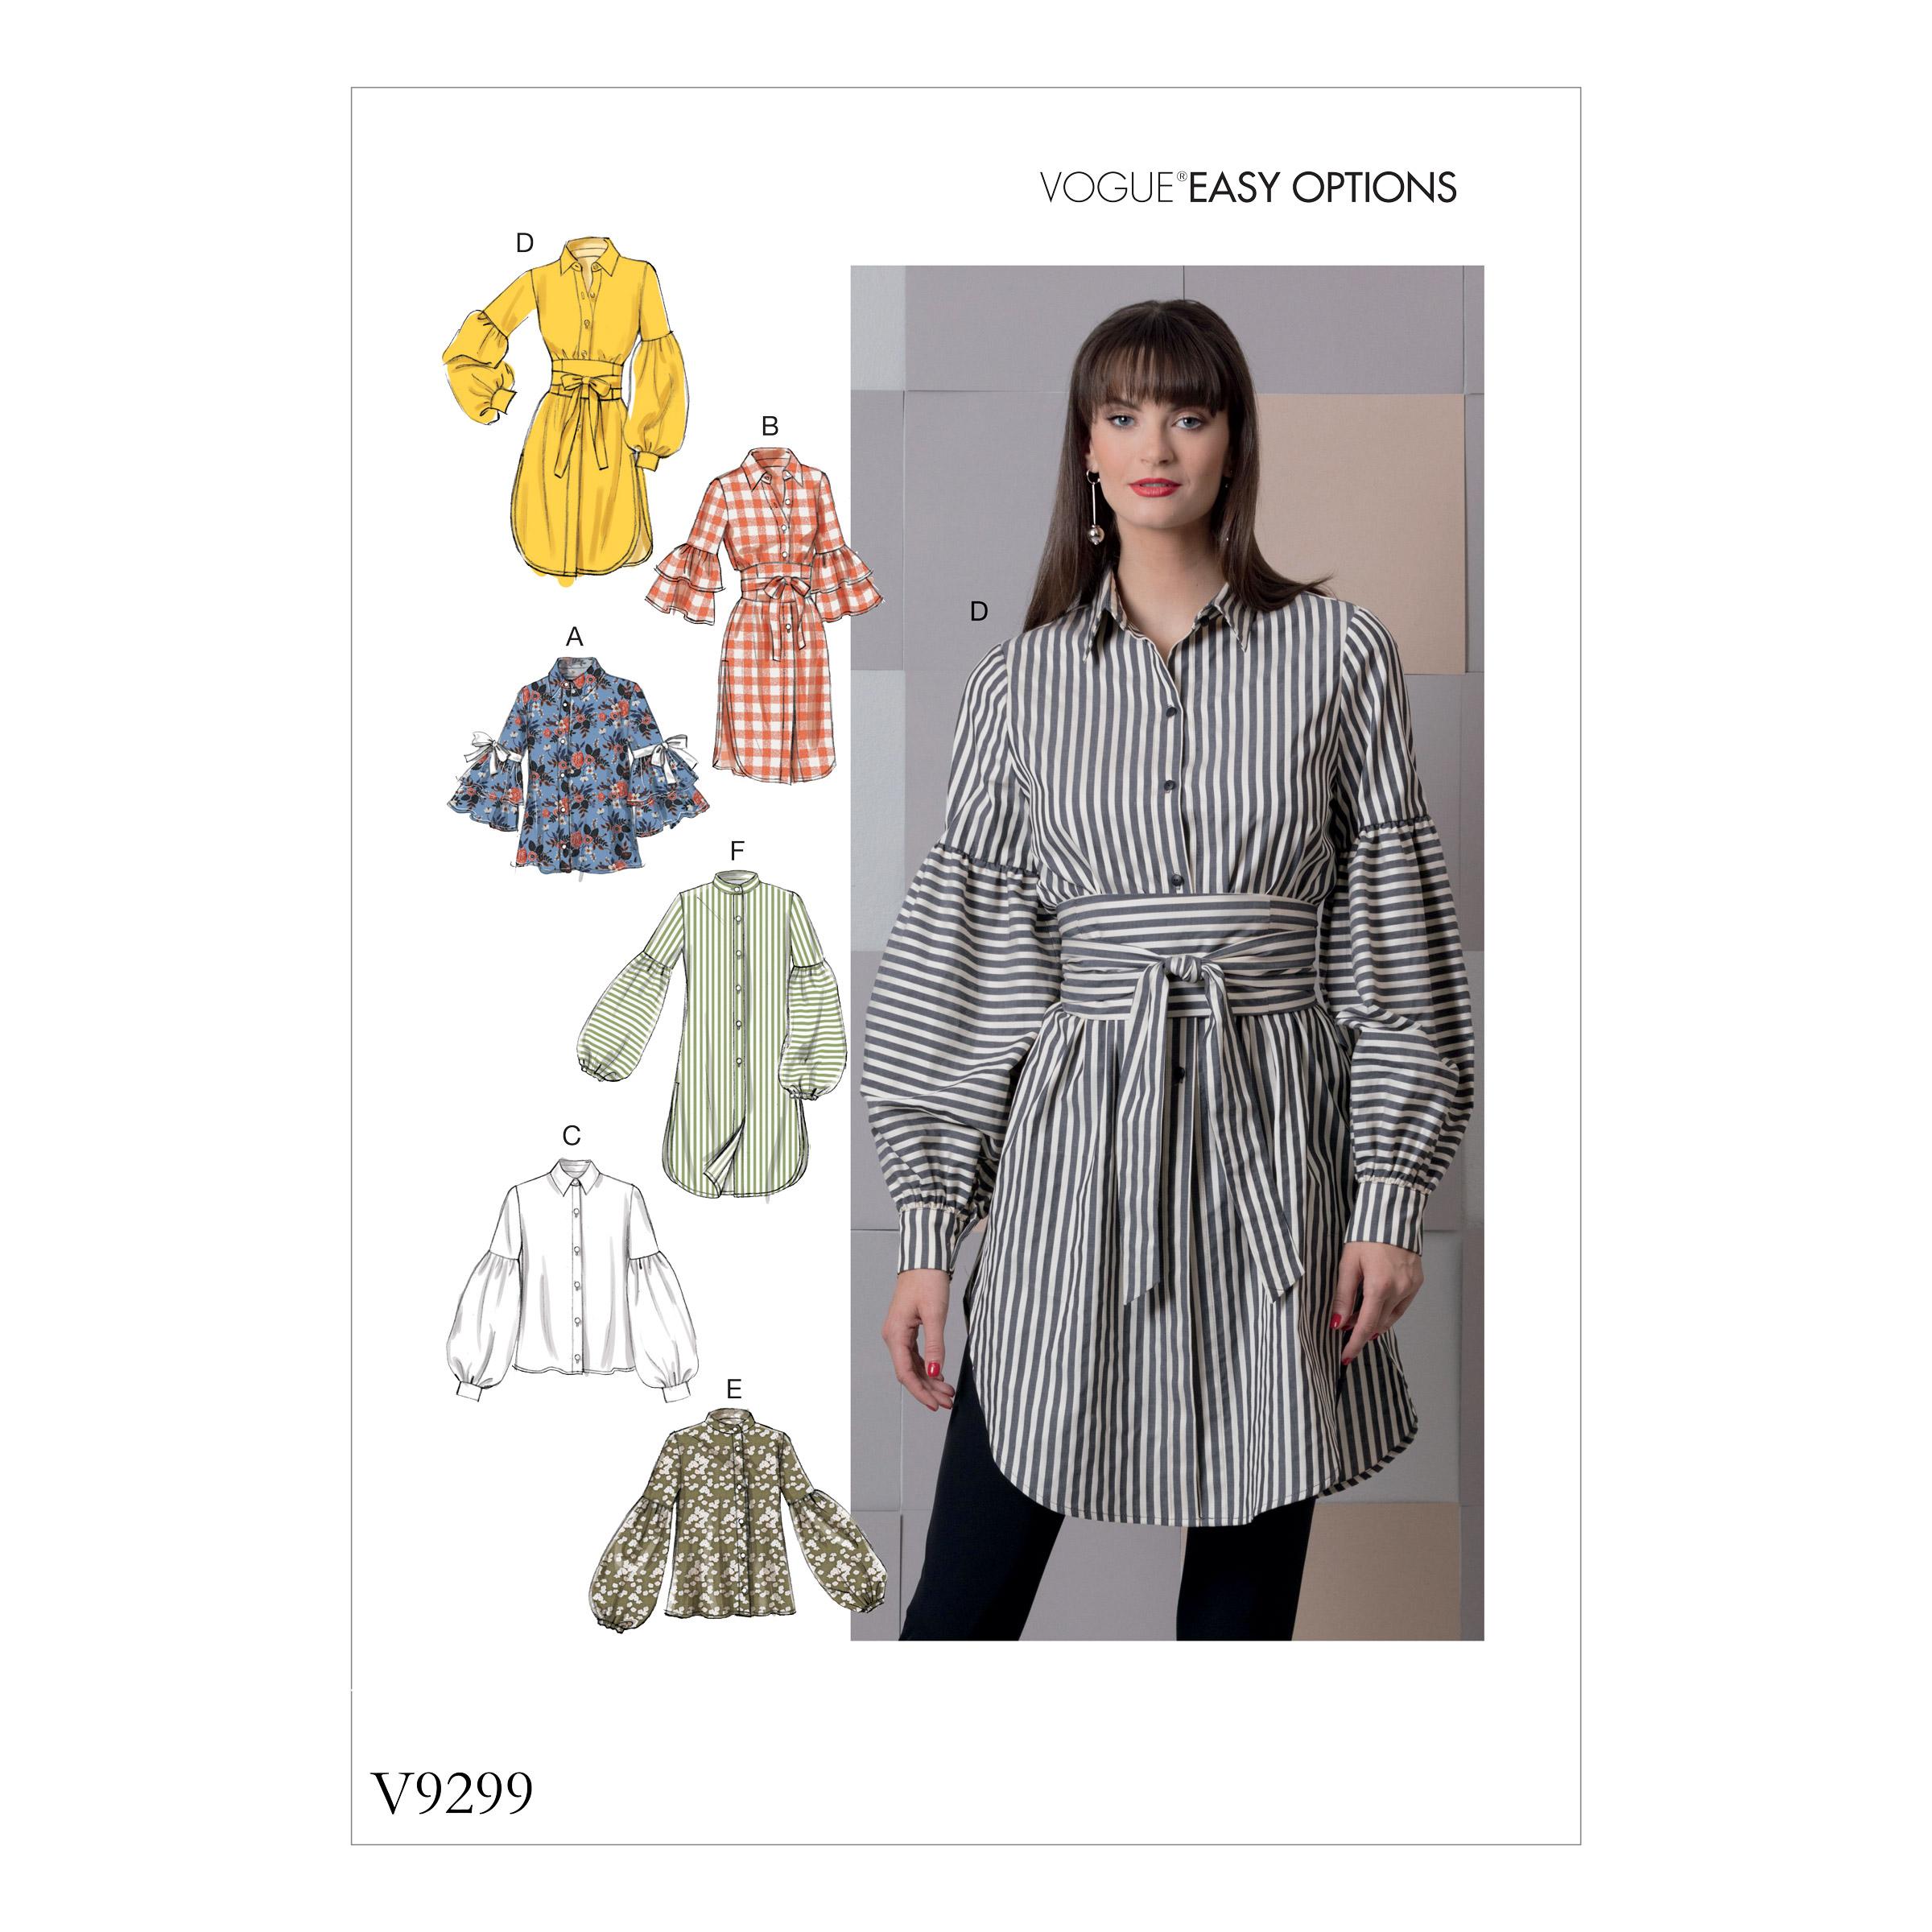 c94414aae7 Vogue Patterns 9299 MISSES' TOP AND BELT